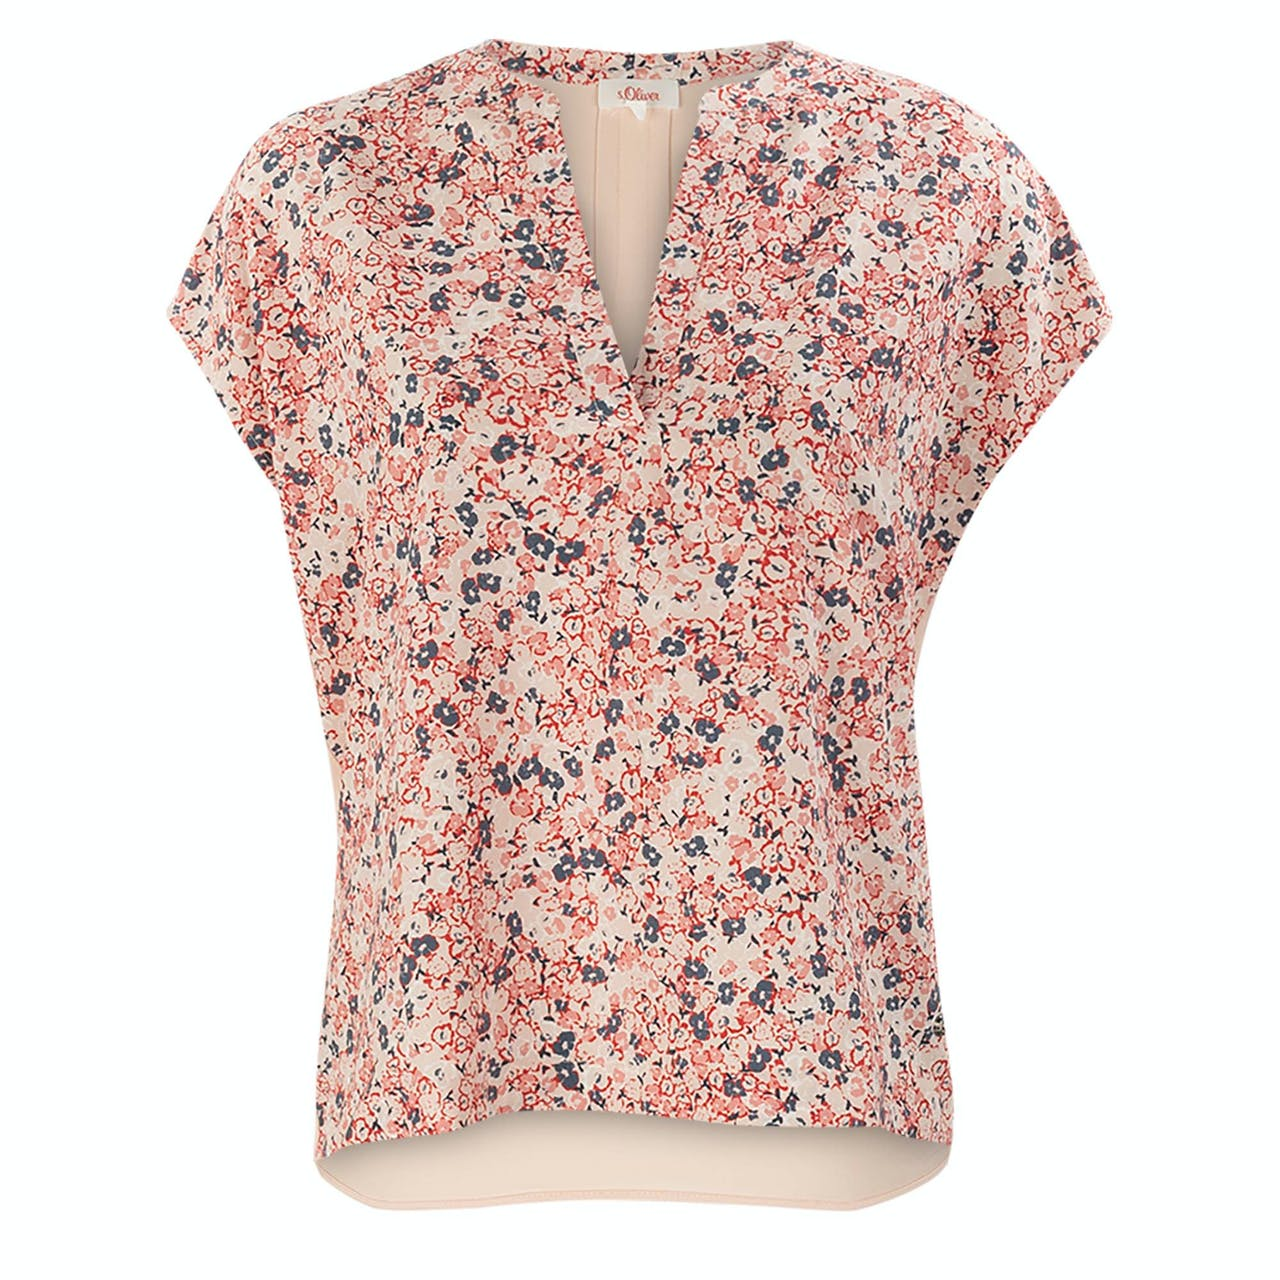 T-Shirt - Regular Fit - Print